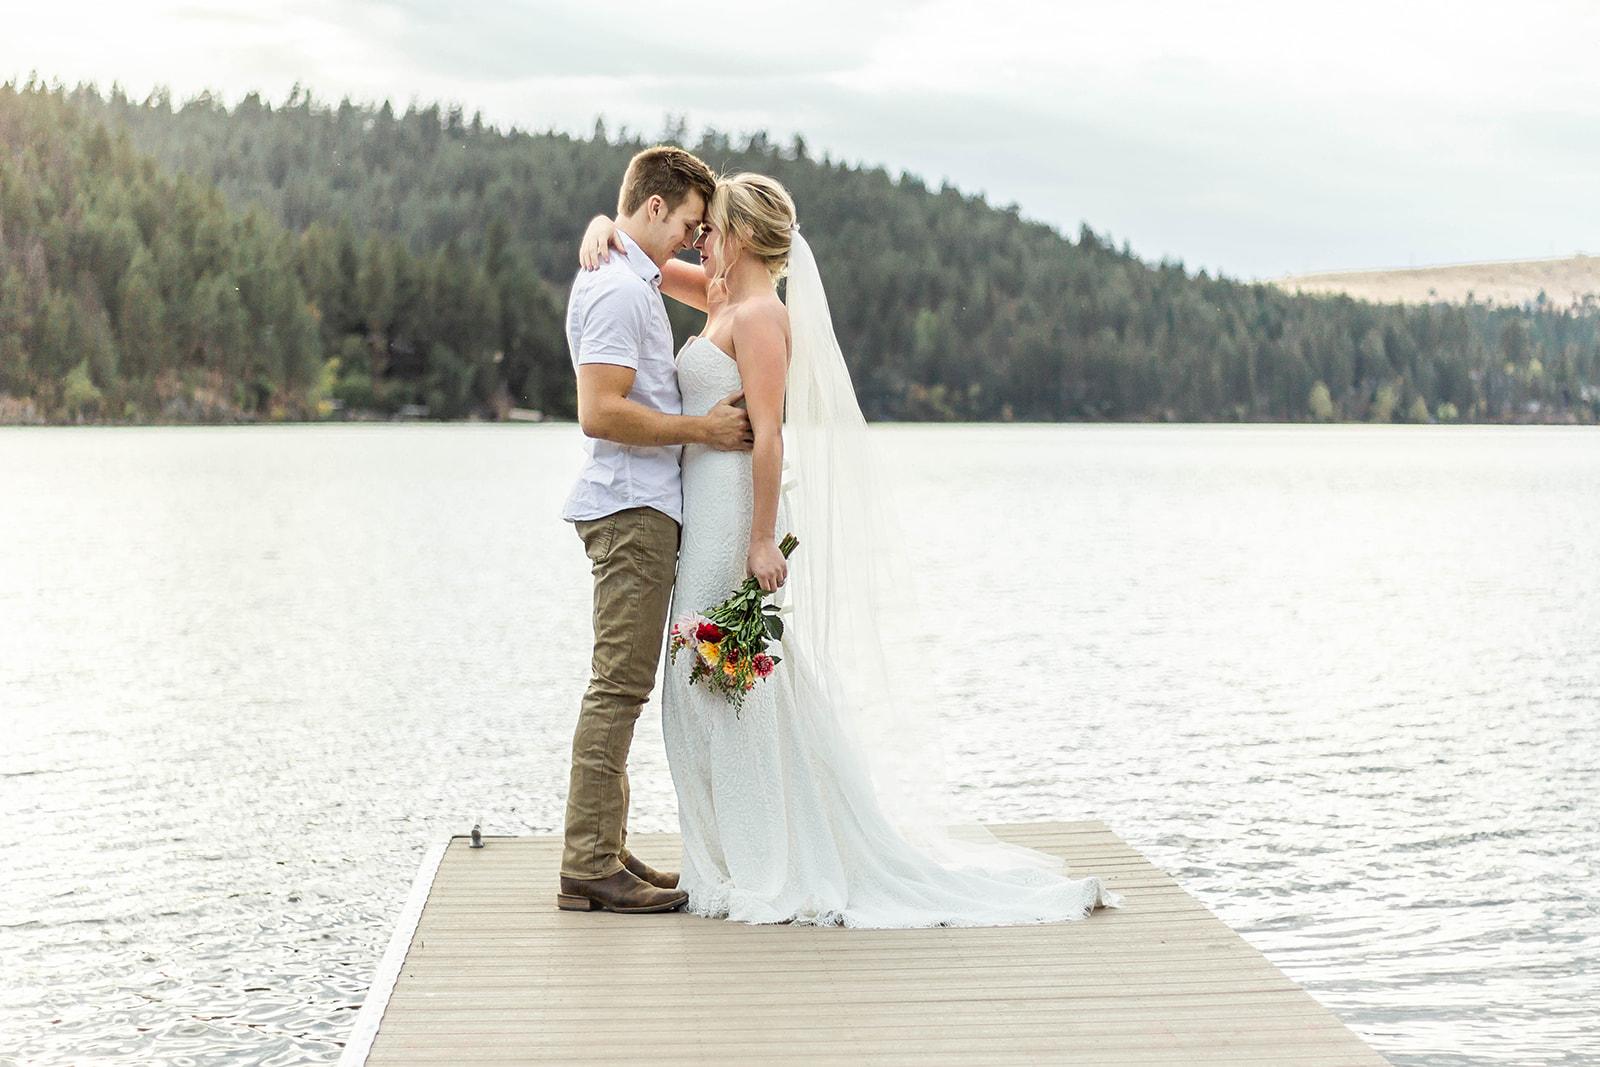 Liberty Lake Washington Wedding Dress Photo shoot 7